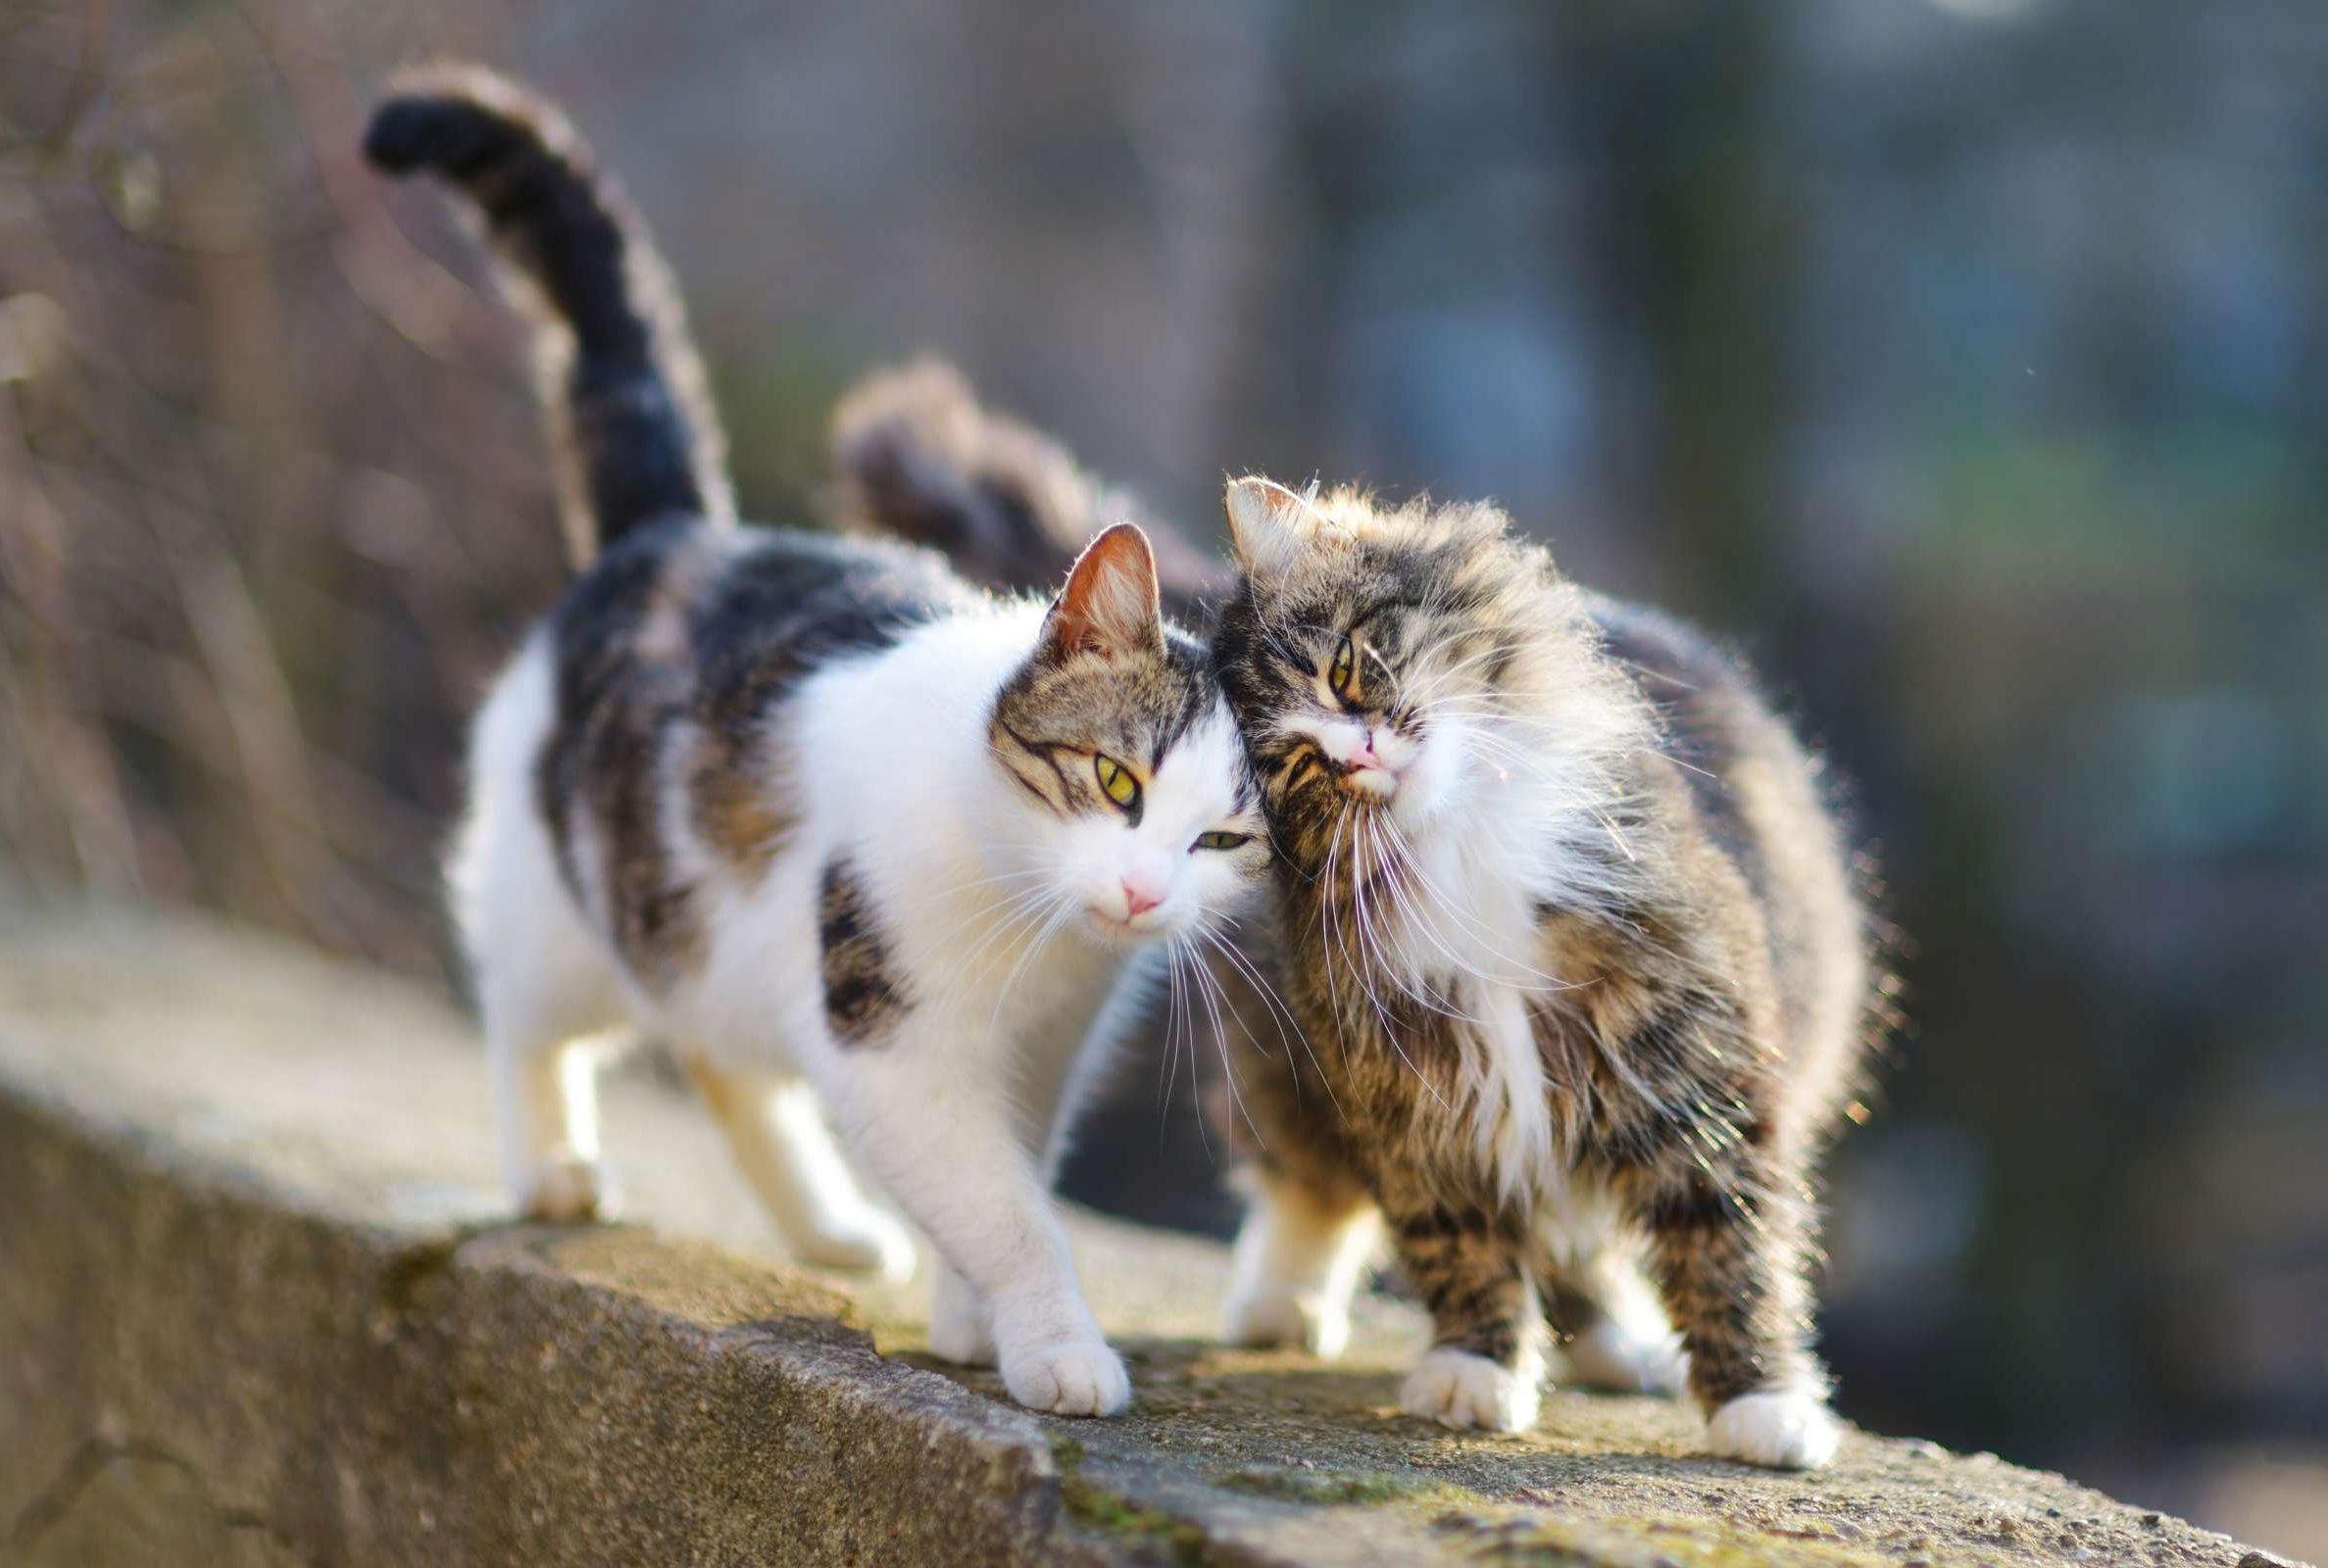 The Healing Power of the Cat Purr | Mental Floss